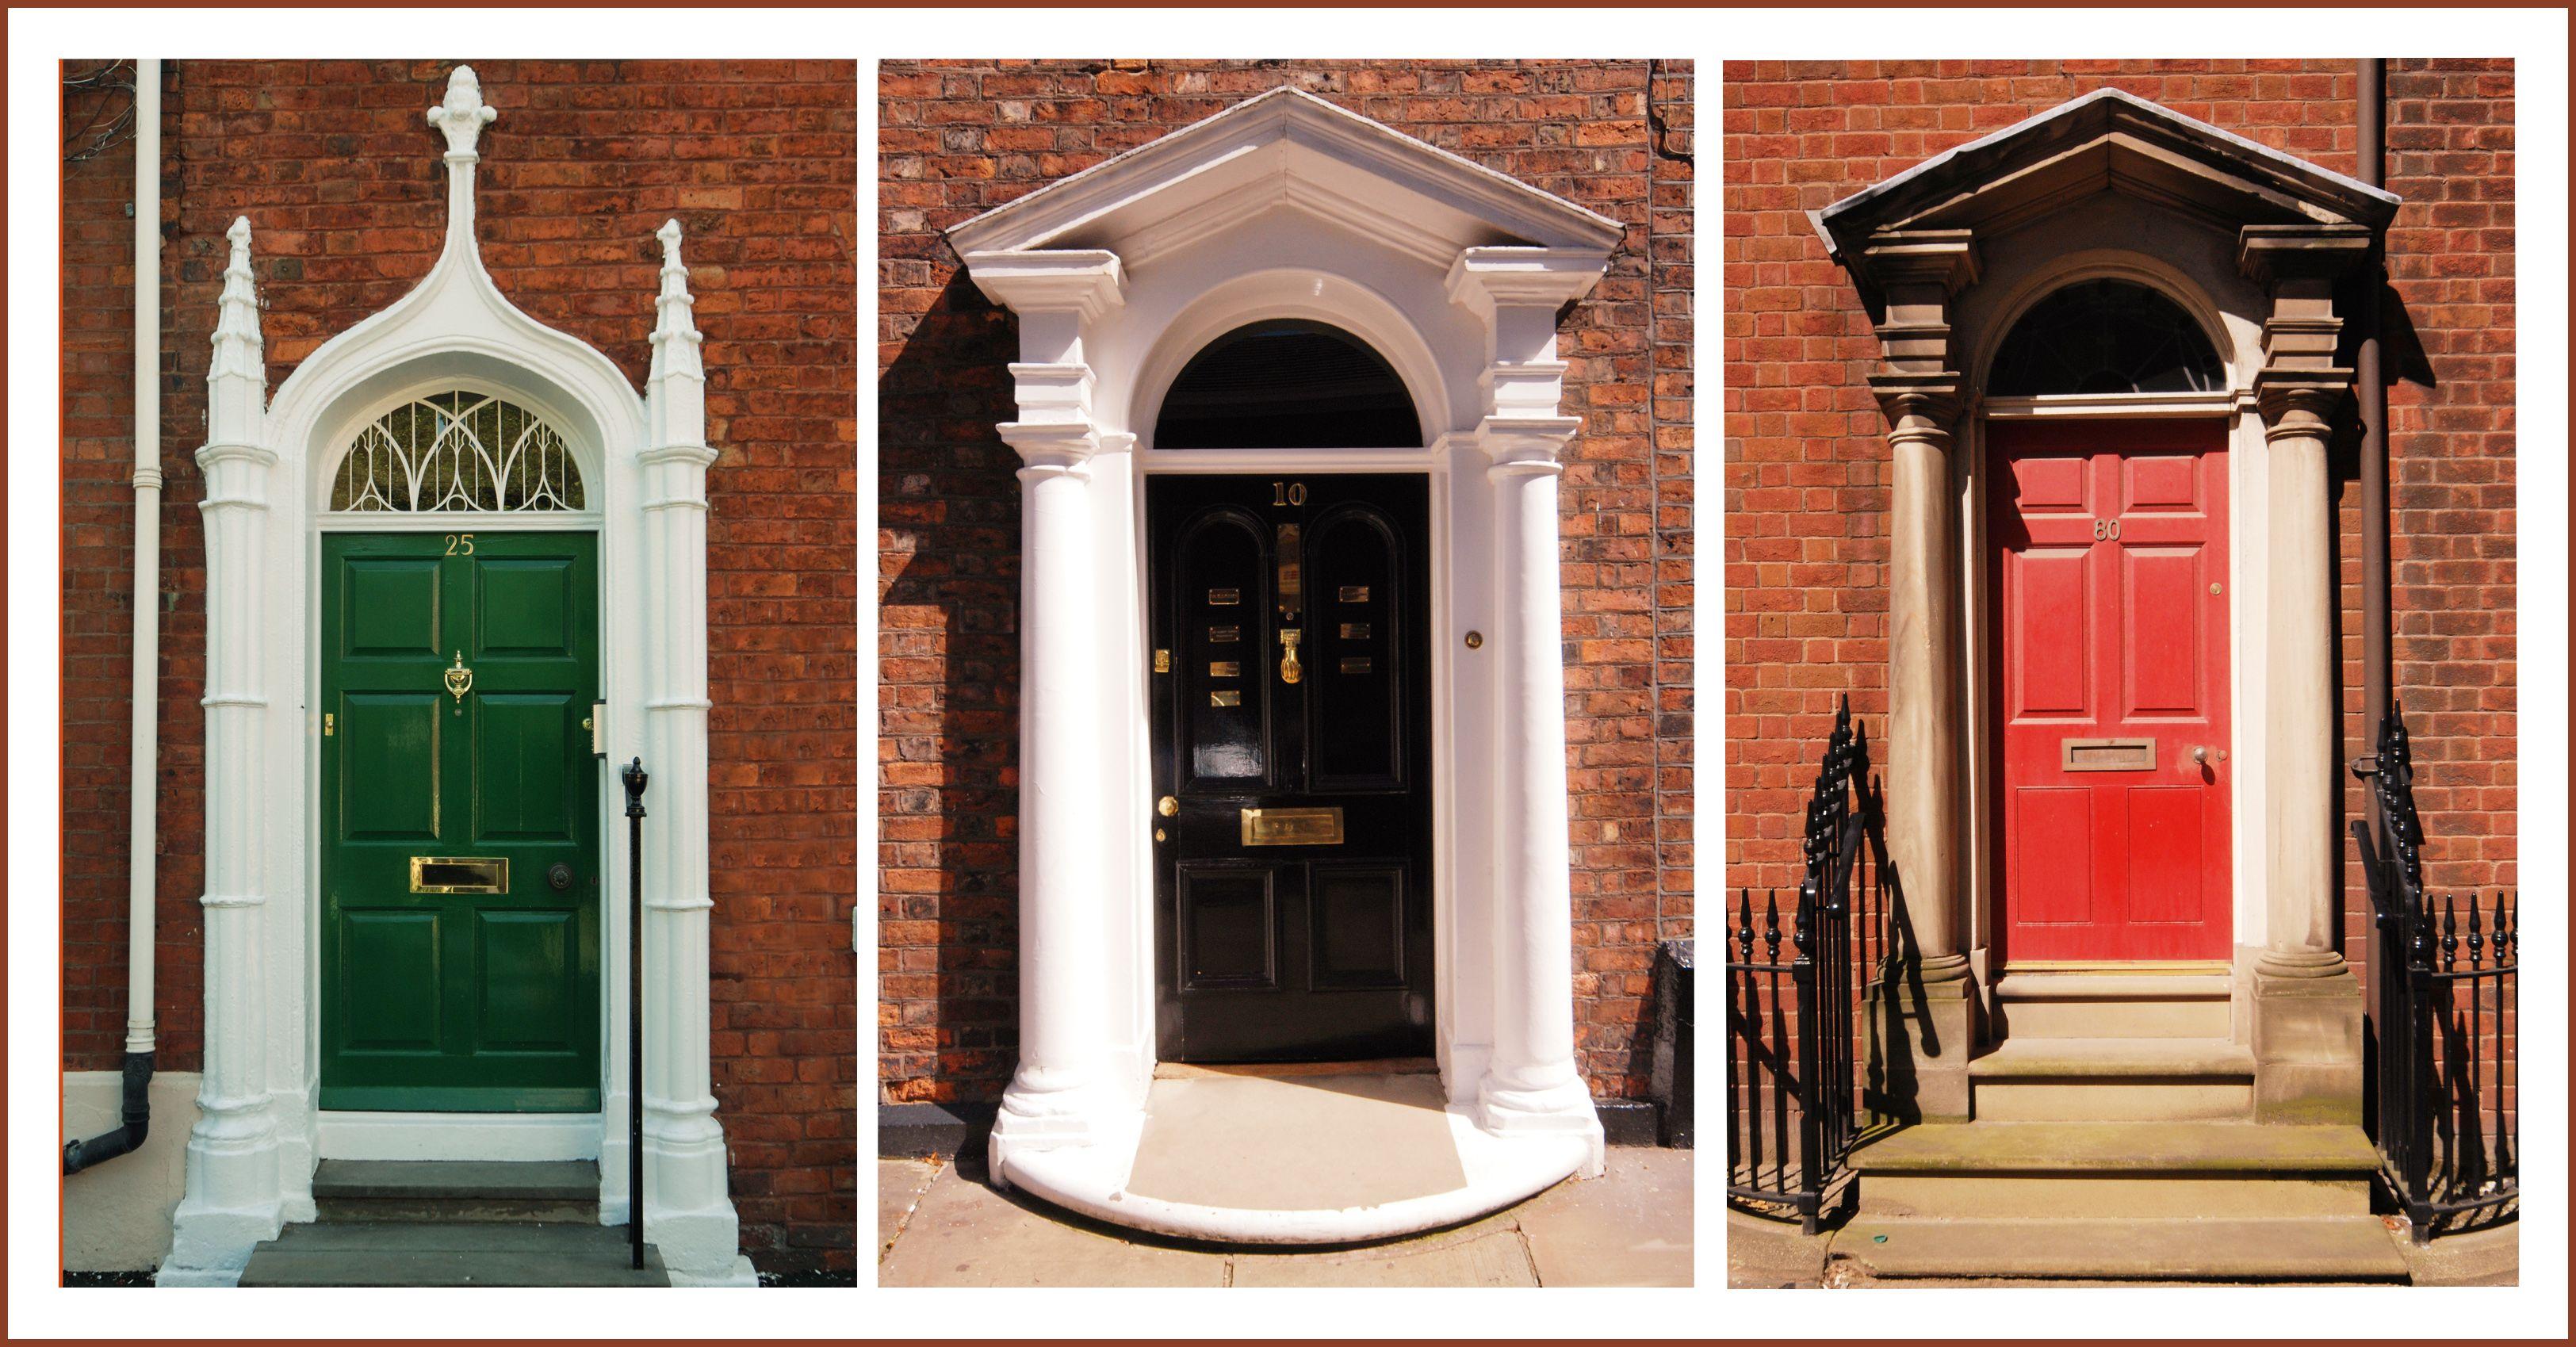 Doors in Manchester & Doors in Manchester | My photographs | Pinterest | Manchester